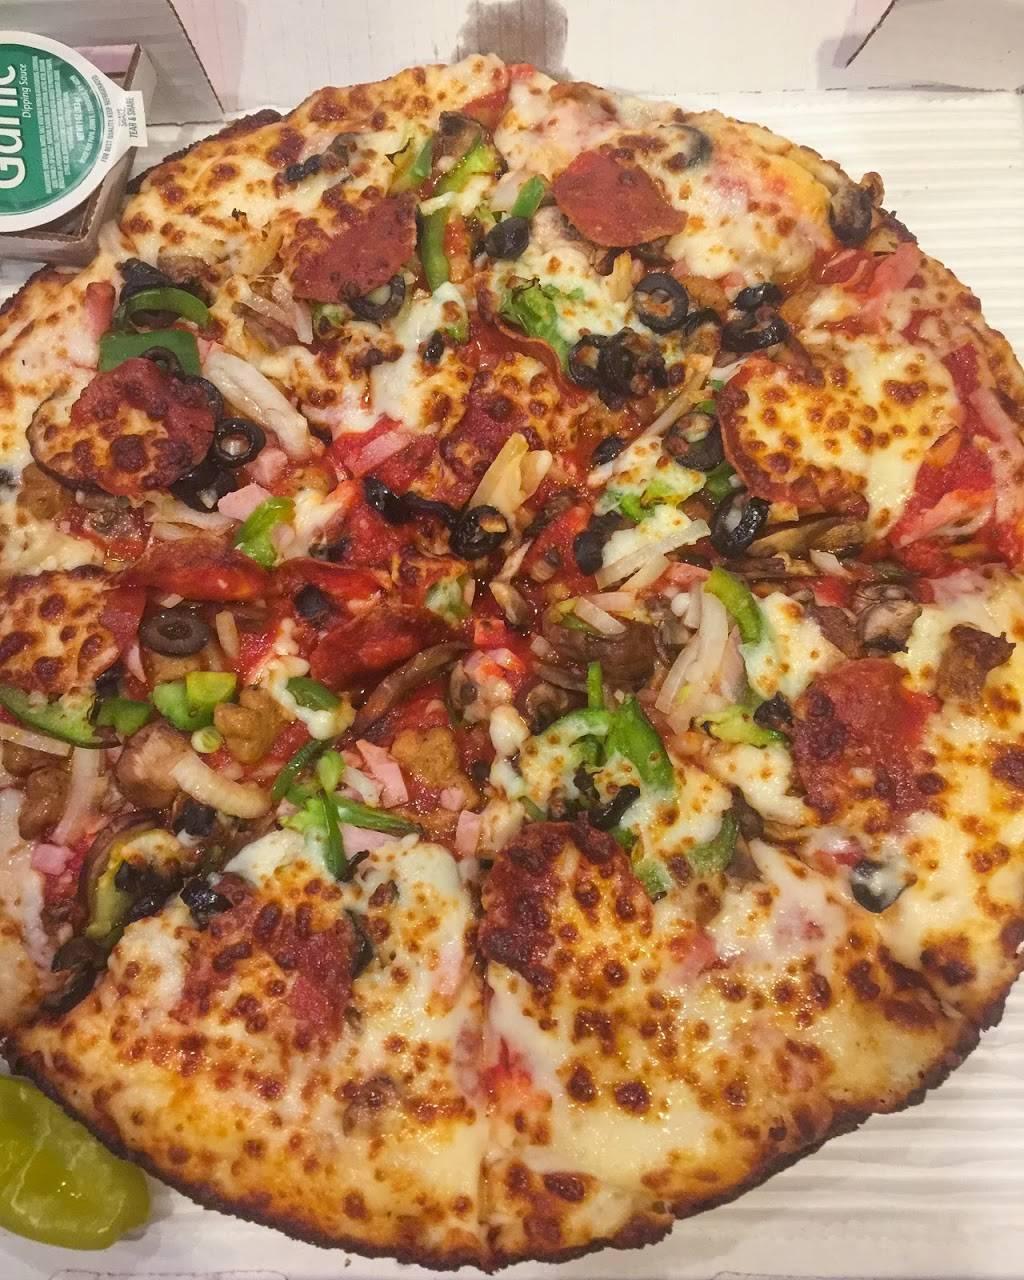 Papa Johns Pizza   restaurant   1721 W, Katella Ave, Anaheim, CA 92804, USA   7149917272 OR +1 714-991-7272